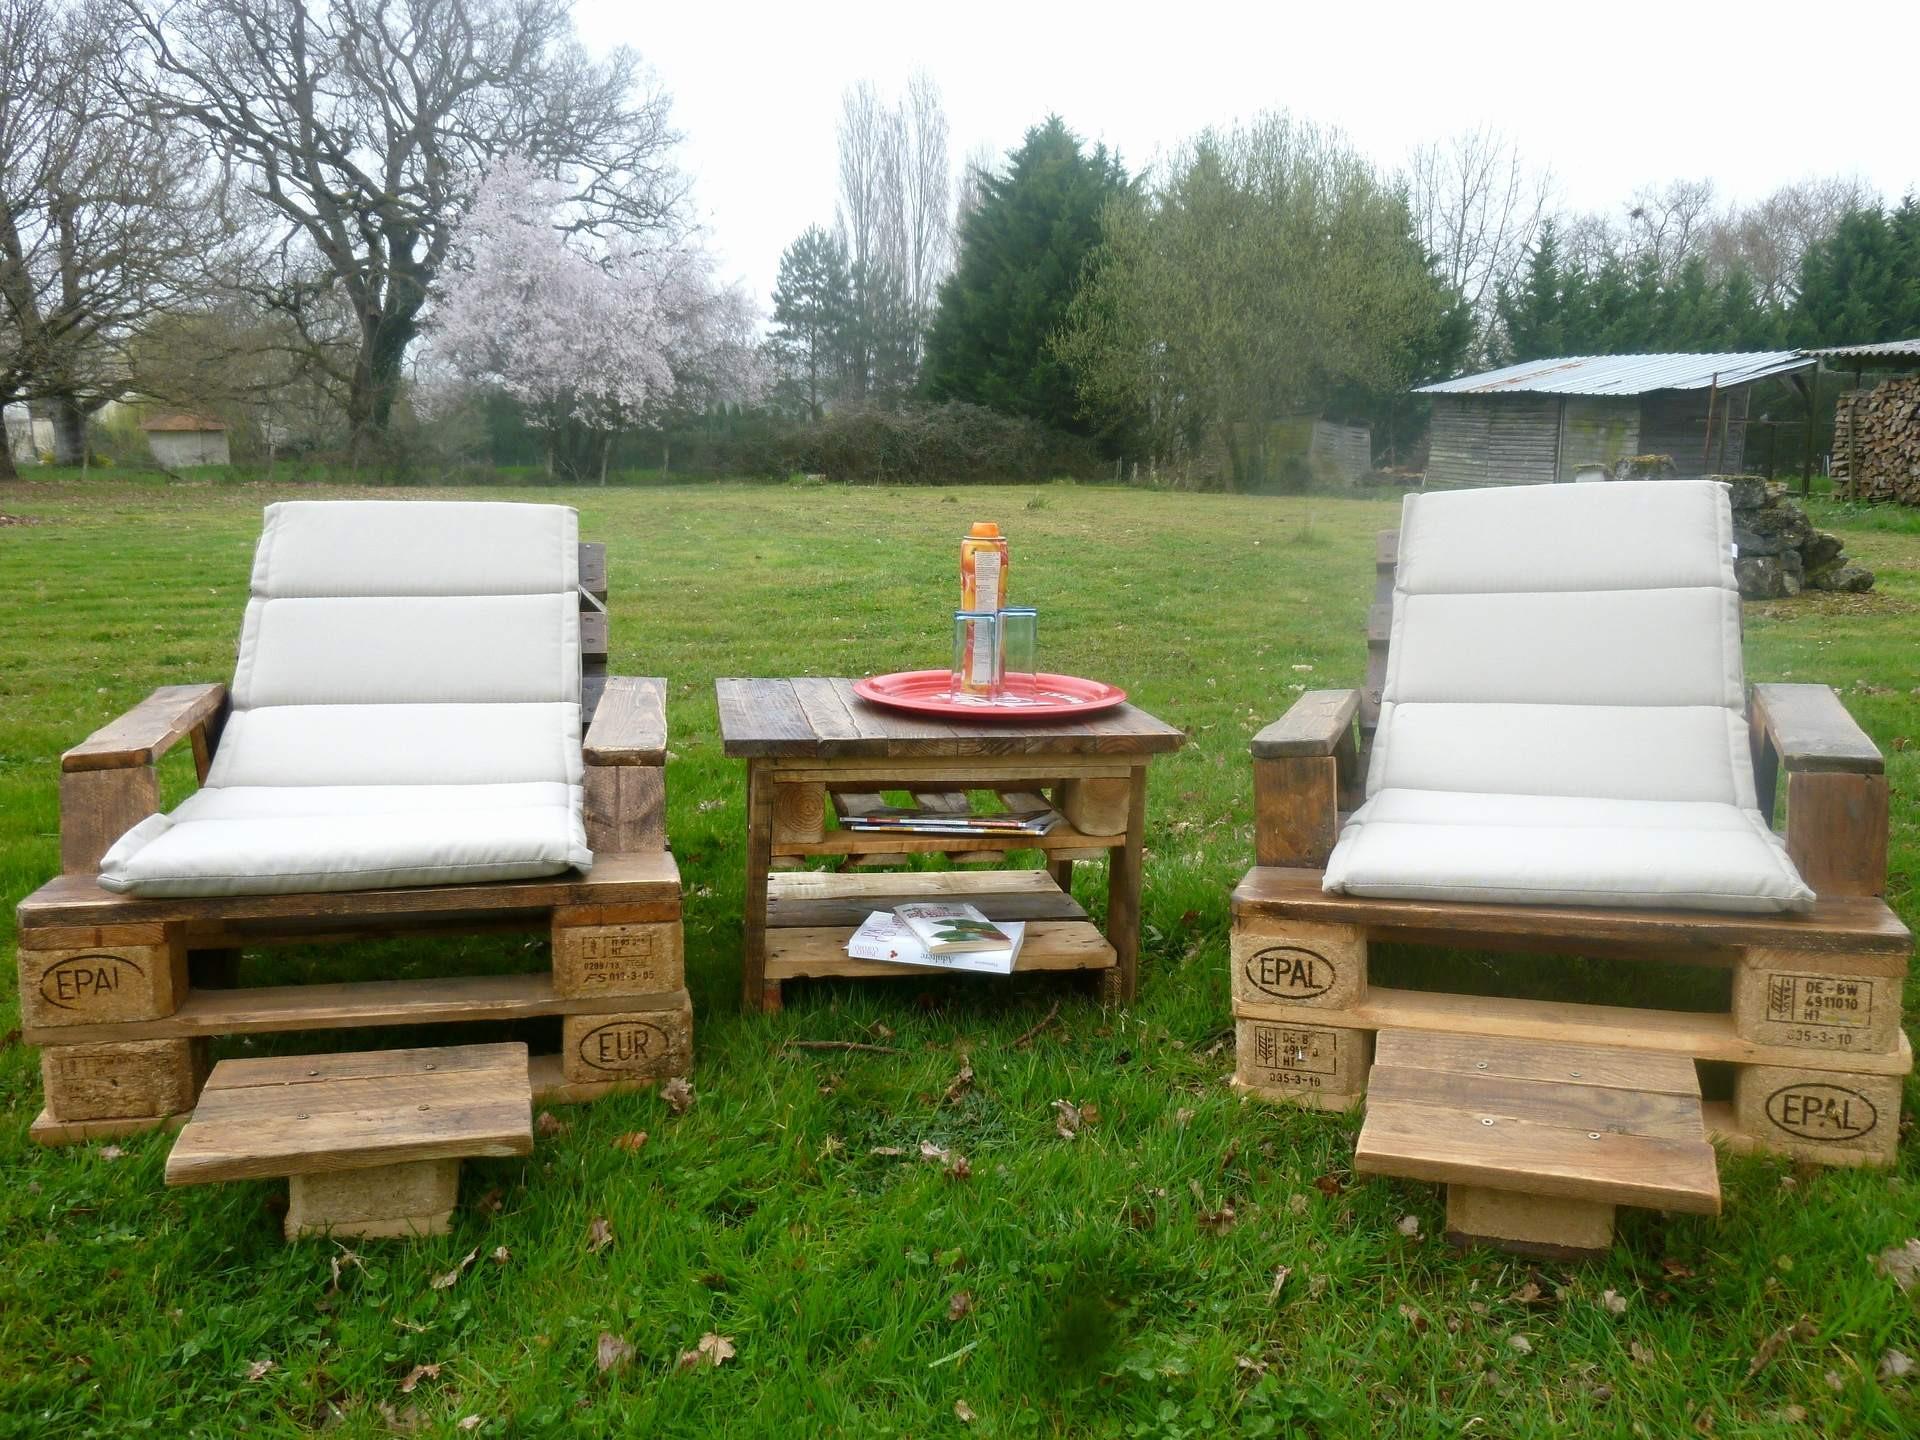 Salon De Jardin Bricoman Inspirant Photos 49 Incroyable Grandes Idées De Abri De Jardin E Leclerc